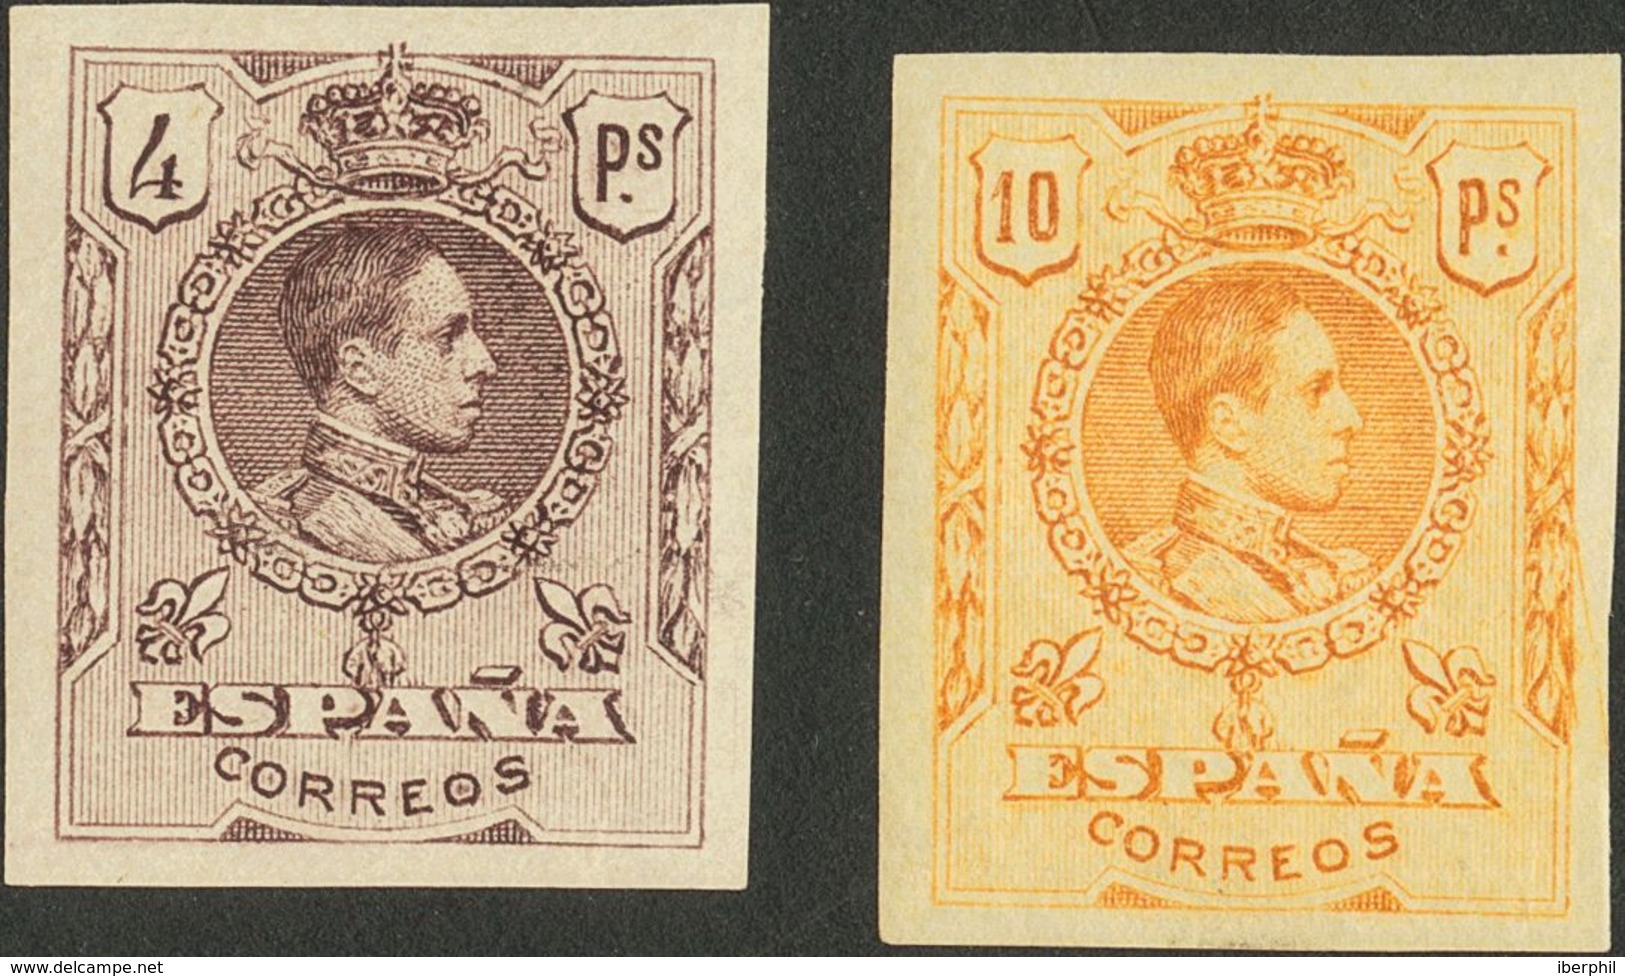 *267/80s. 1909. Serie Completa. SIN DENTAR. MAGNIFICA. Edifil 2019: 1.204,6 Euros - Spain